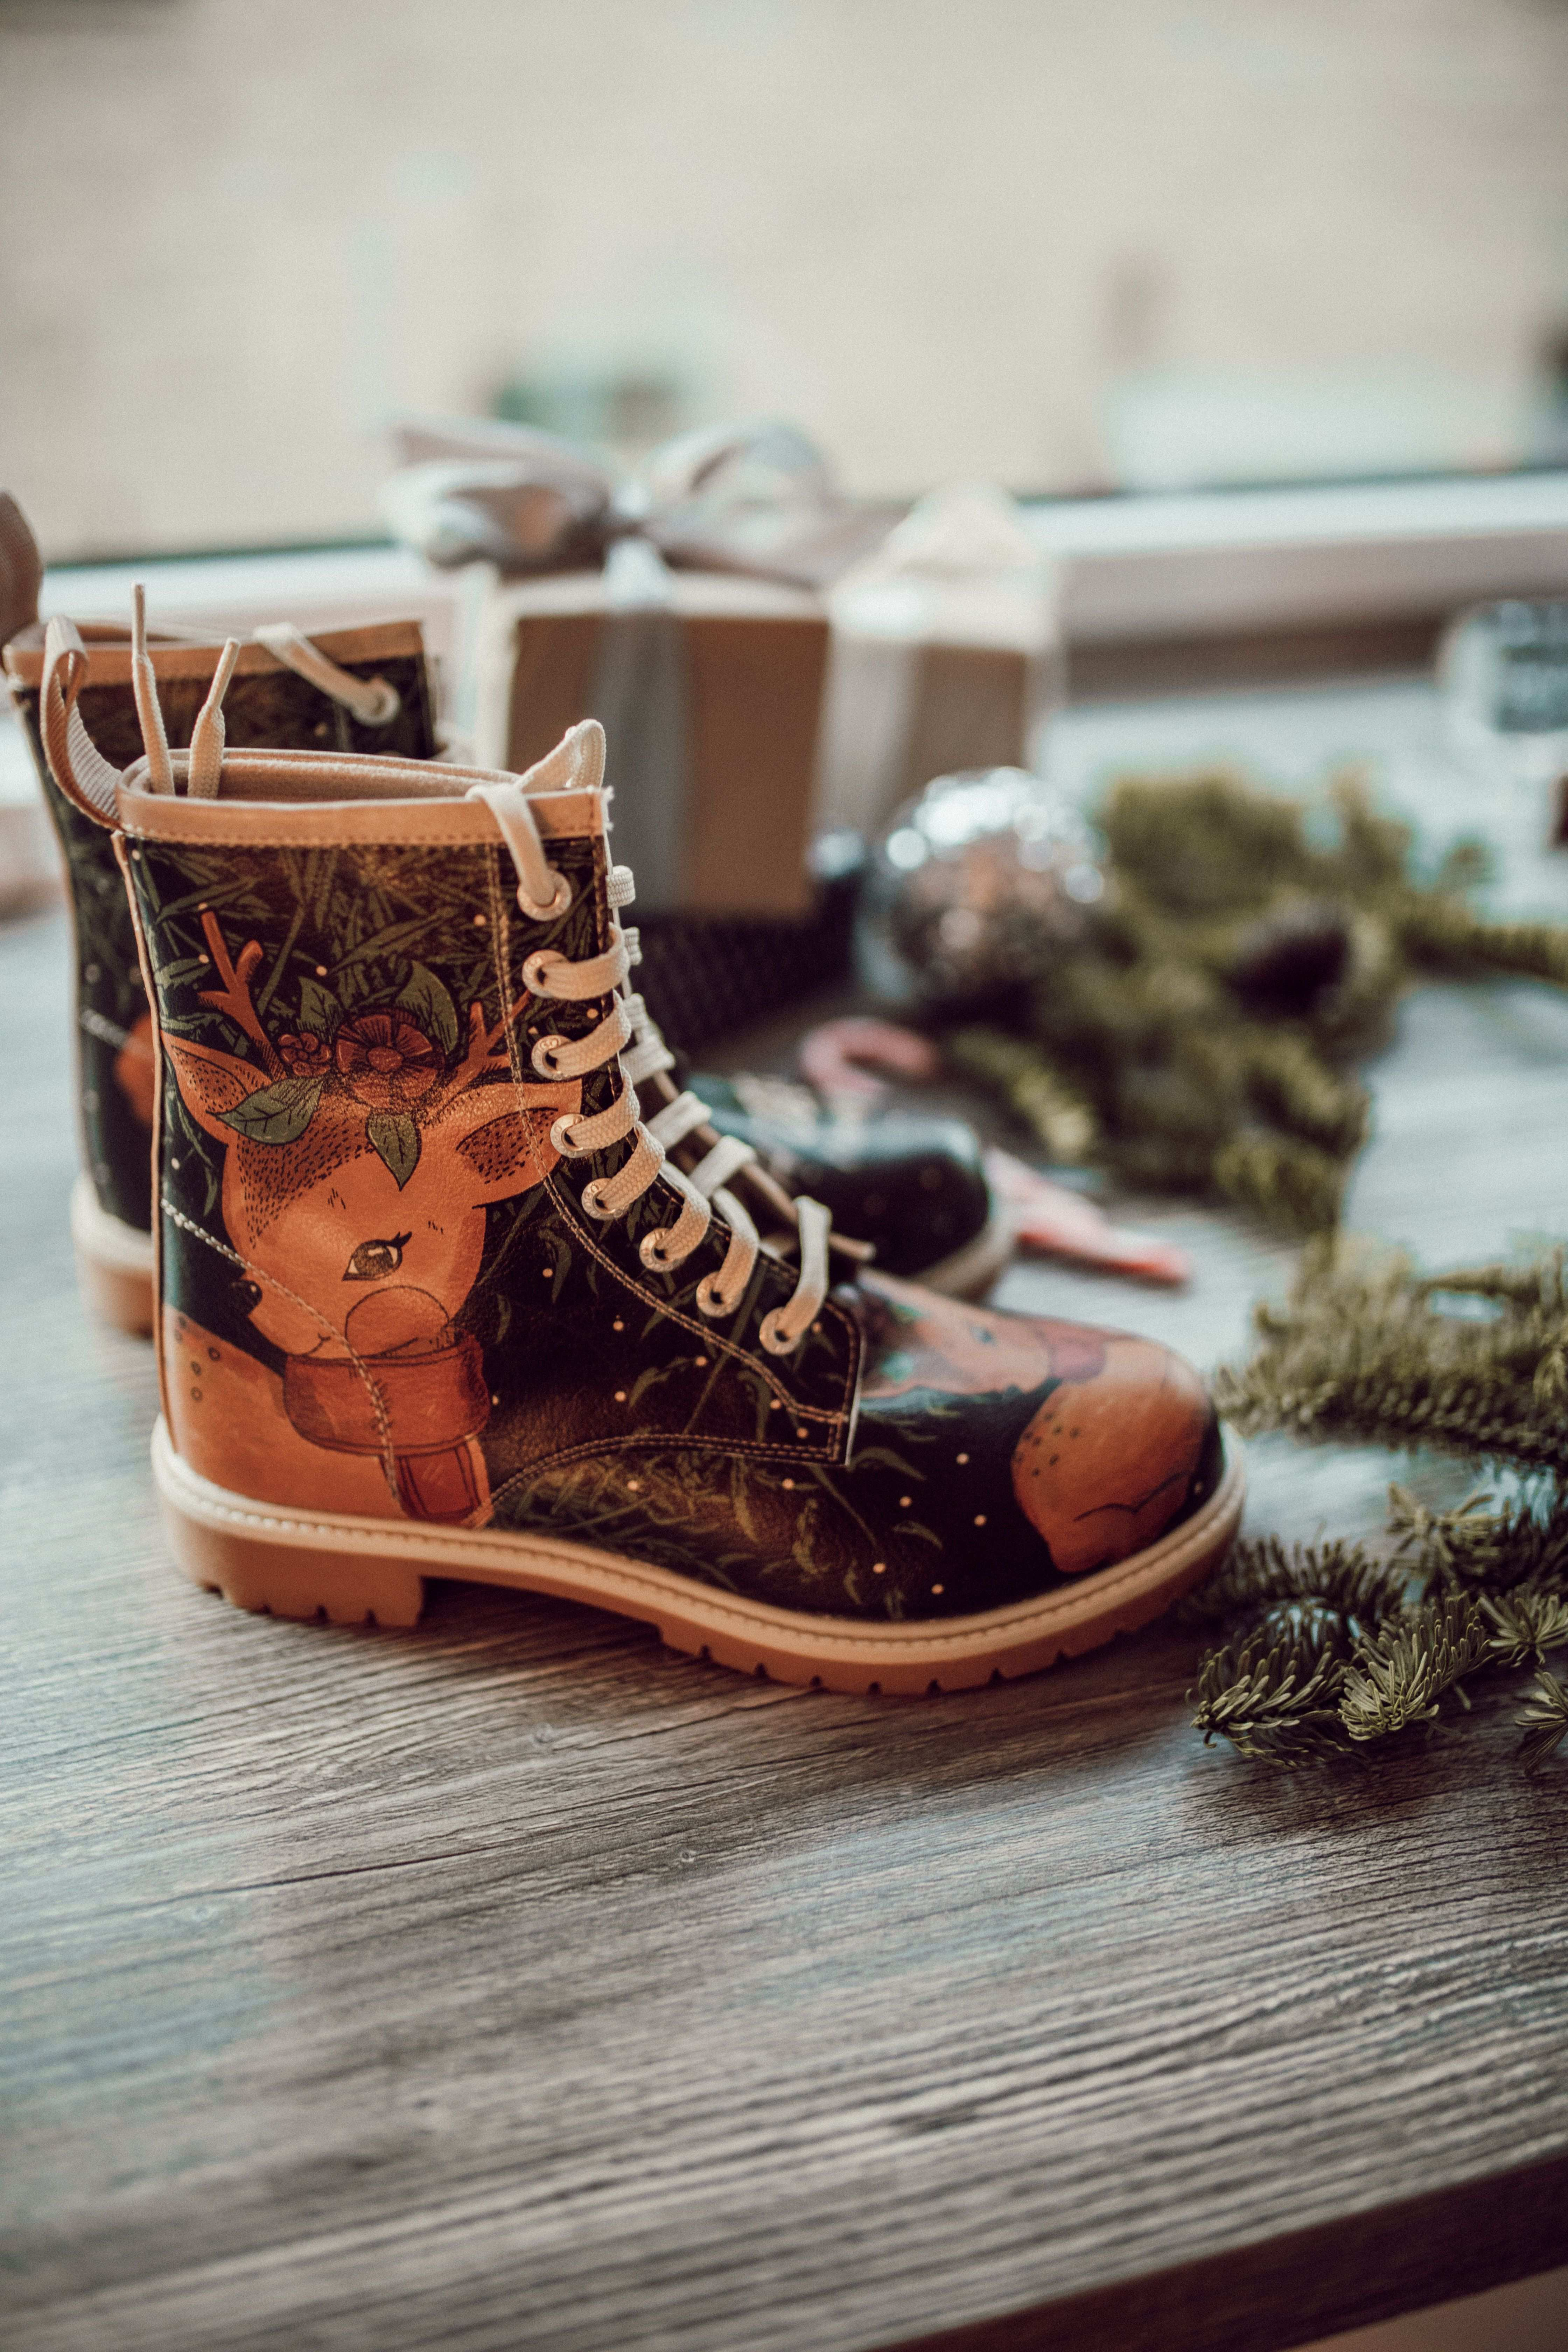 Dogo Boots I Love You So In Allen Grossen 99 95 Damen Boots Ausgefallene Schuhe Stiefeletten